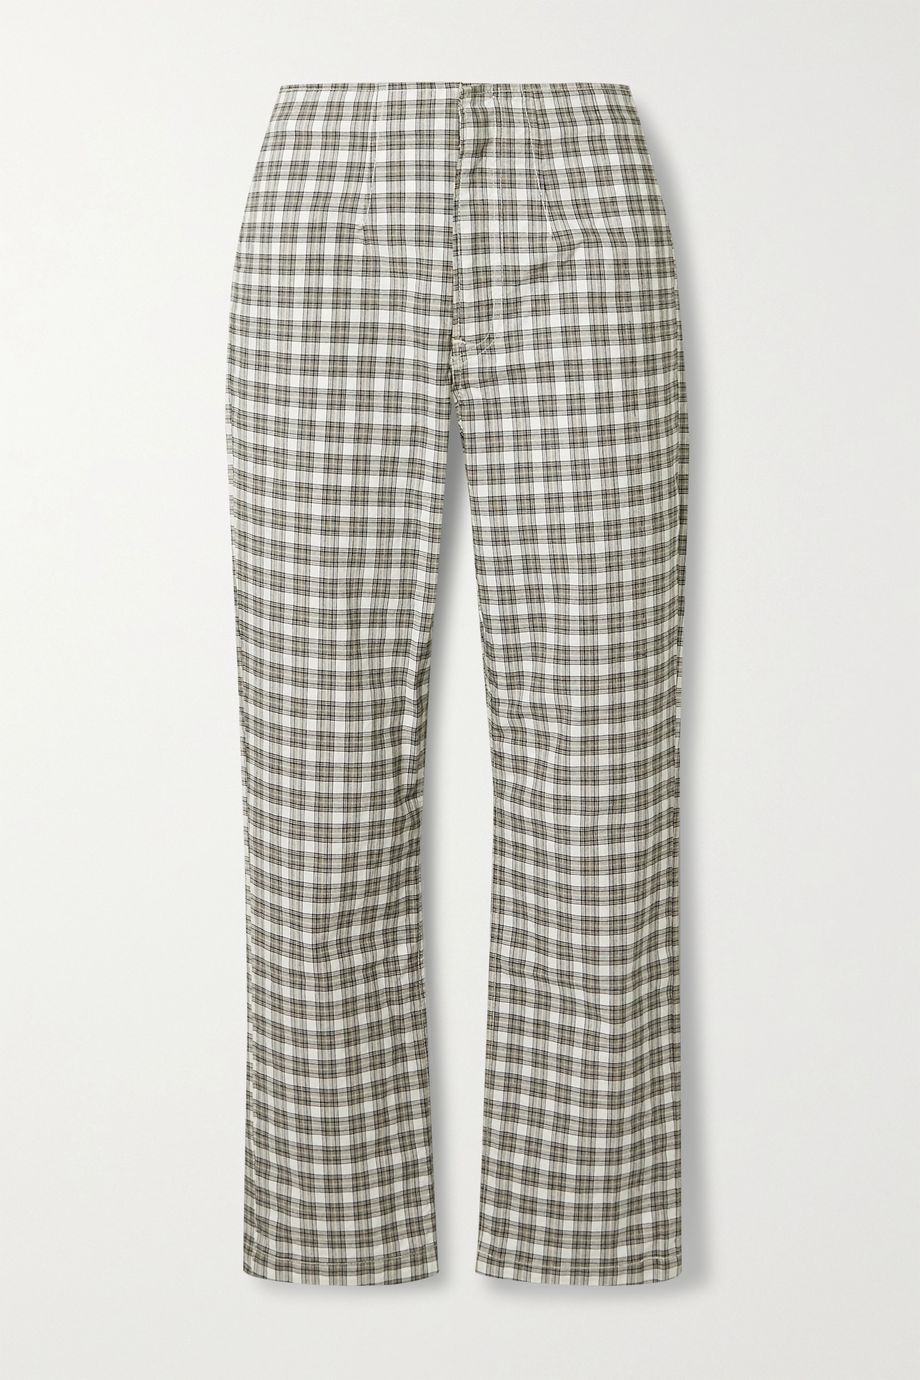 Reformation Lela checked stretch-cotton straight-leg pants